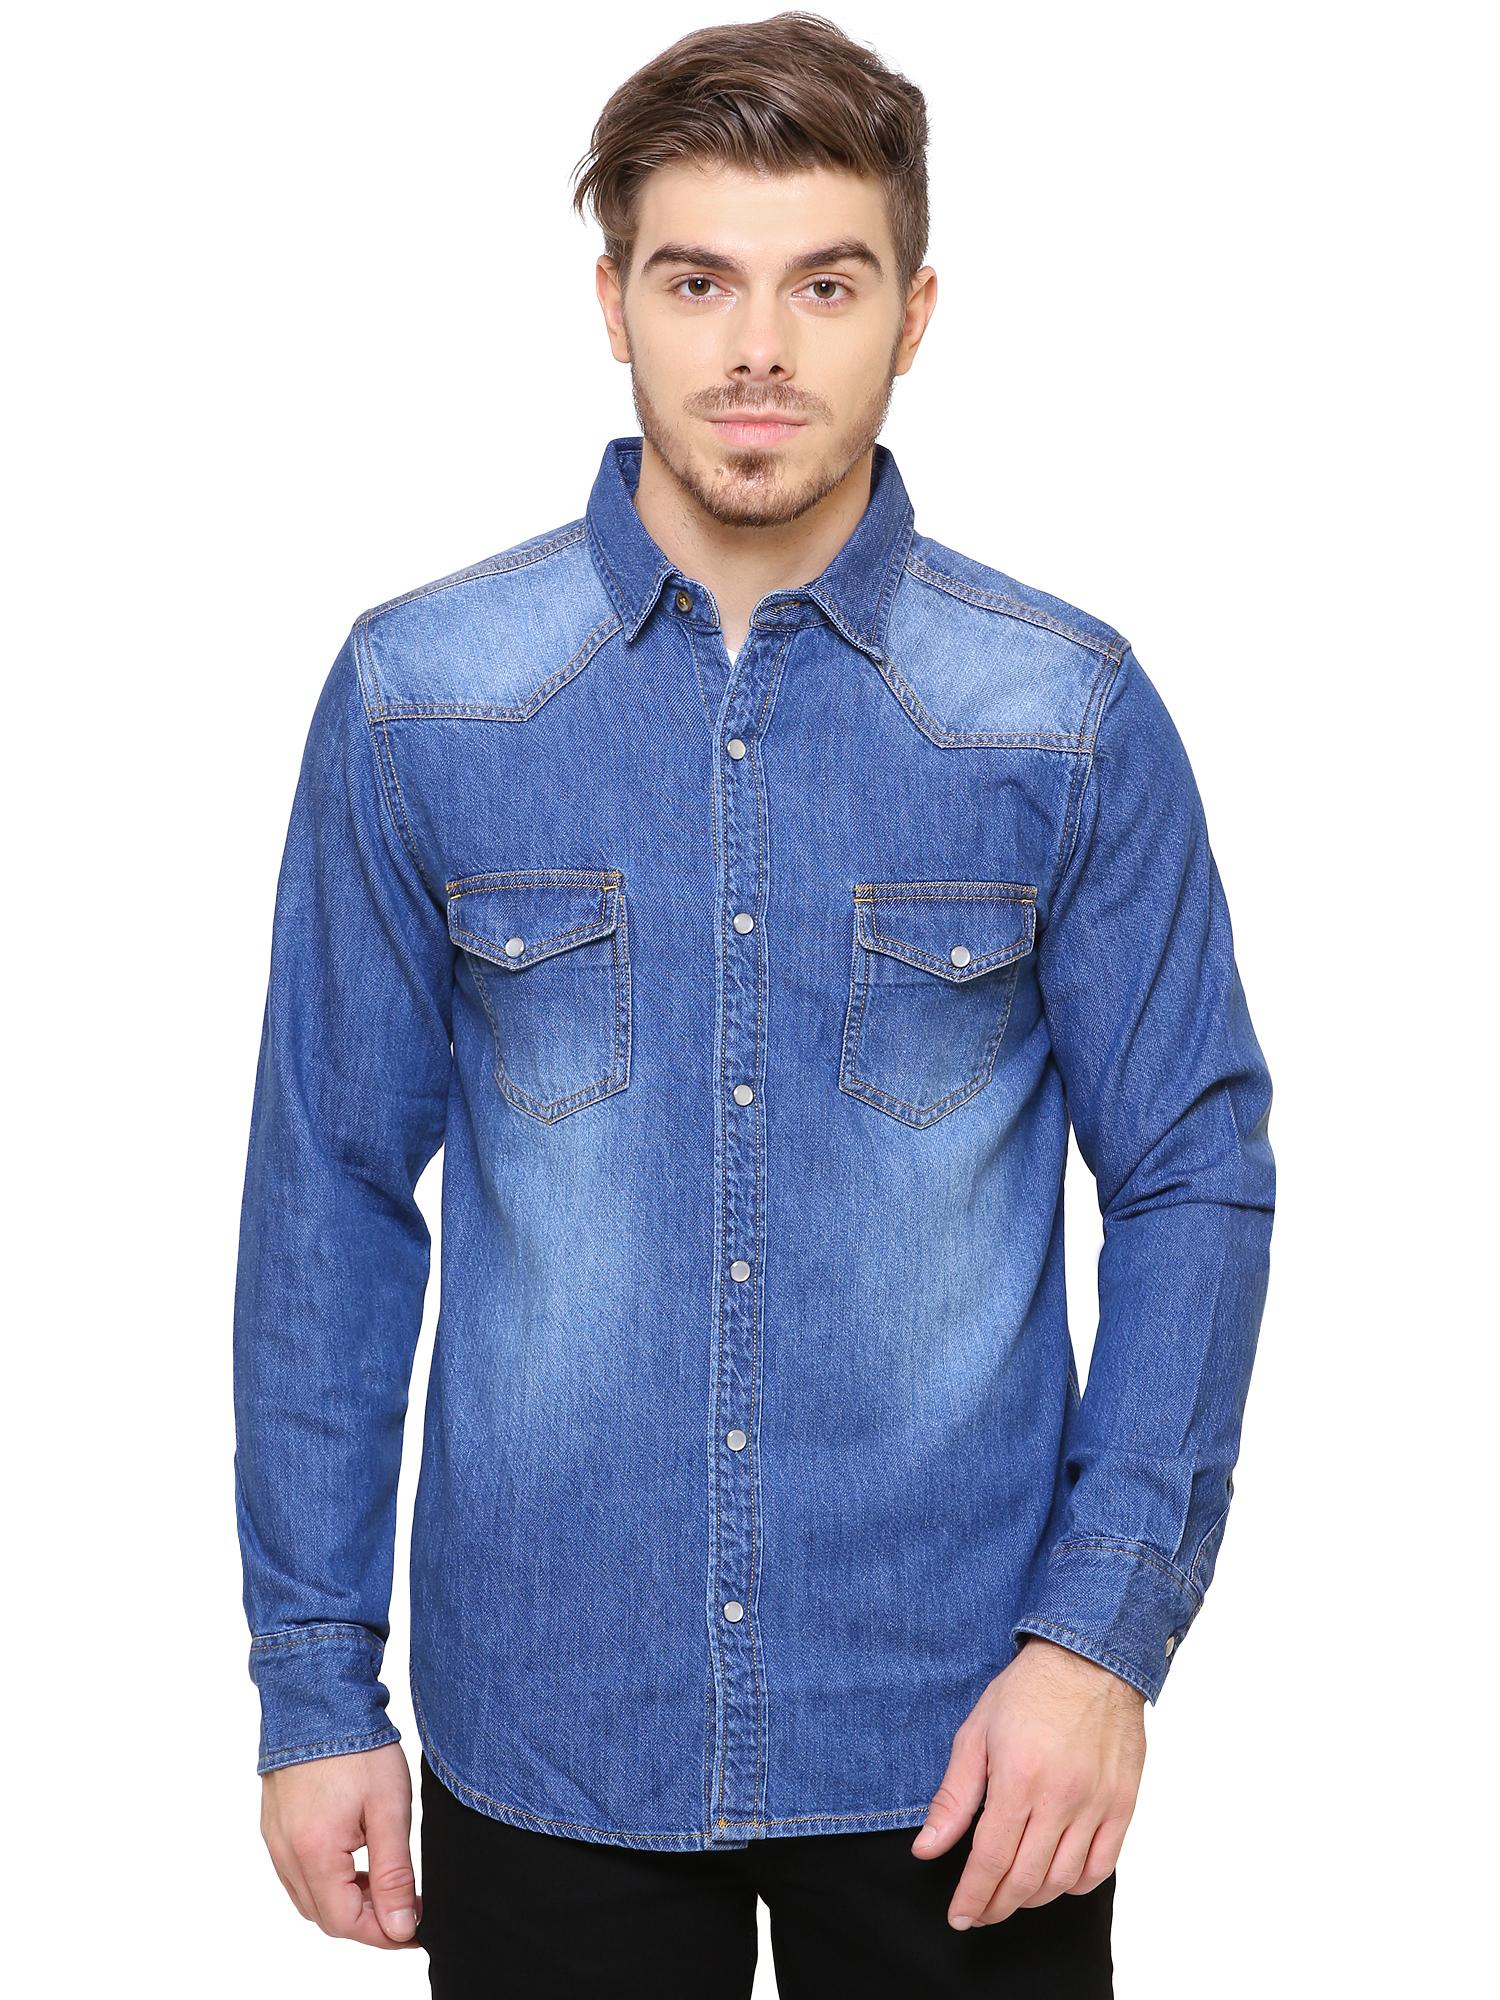 Southbay   Southbay Men's Medium Blue Casual Denim Shirt- SBCLFS734MBU